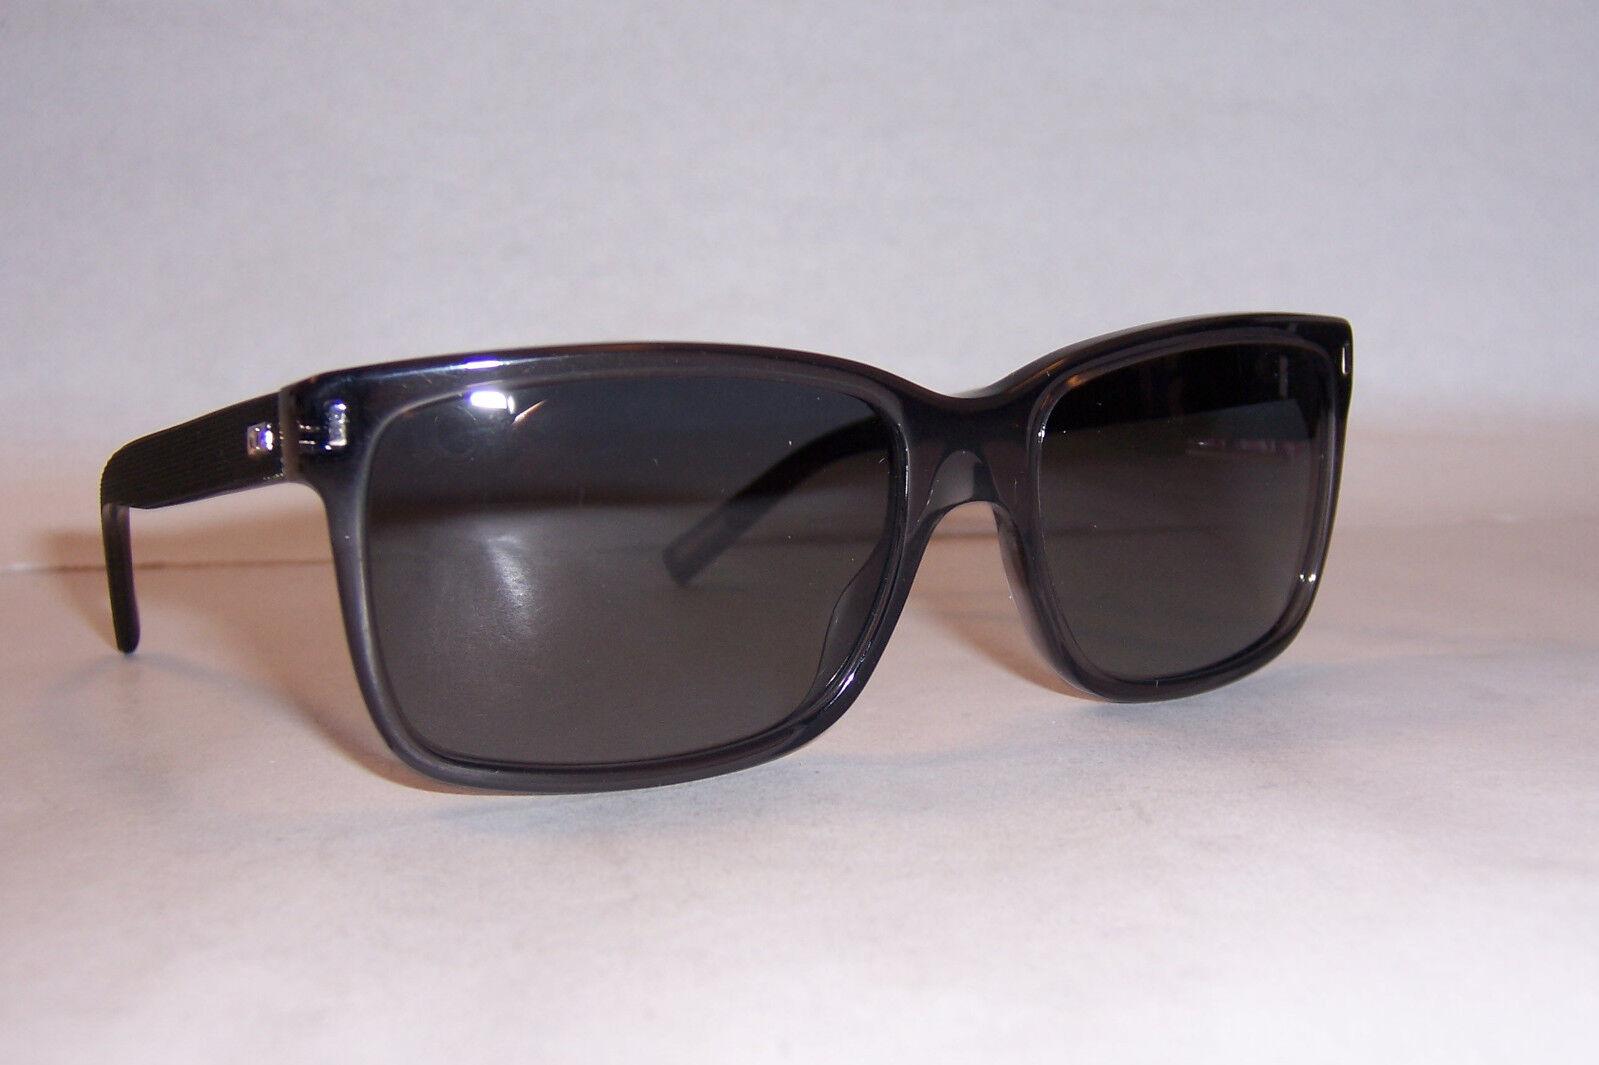 cacee3ef059bc Christian Dior Sunglasses Men CD Black Tie CD 155 Grey 5S6HD 56mm ...